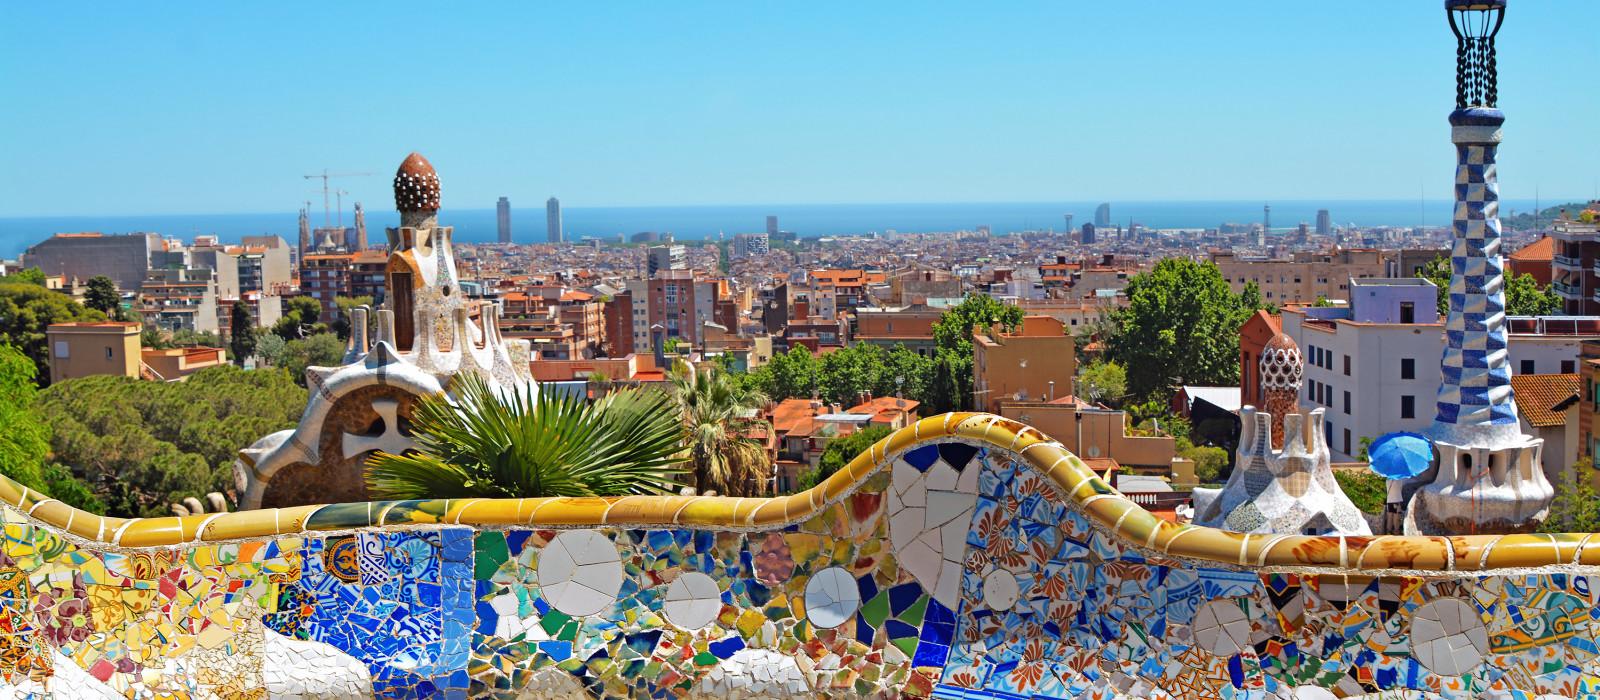 Reiseziel Barcelona Spanien